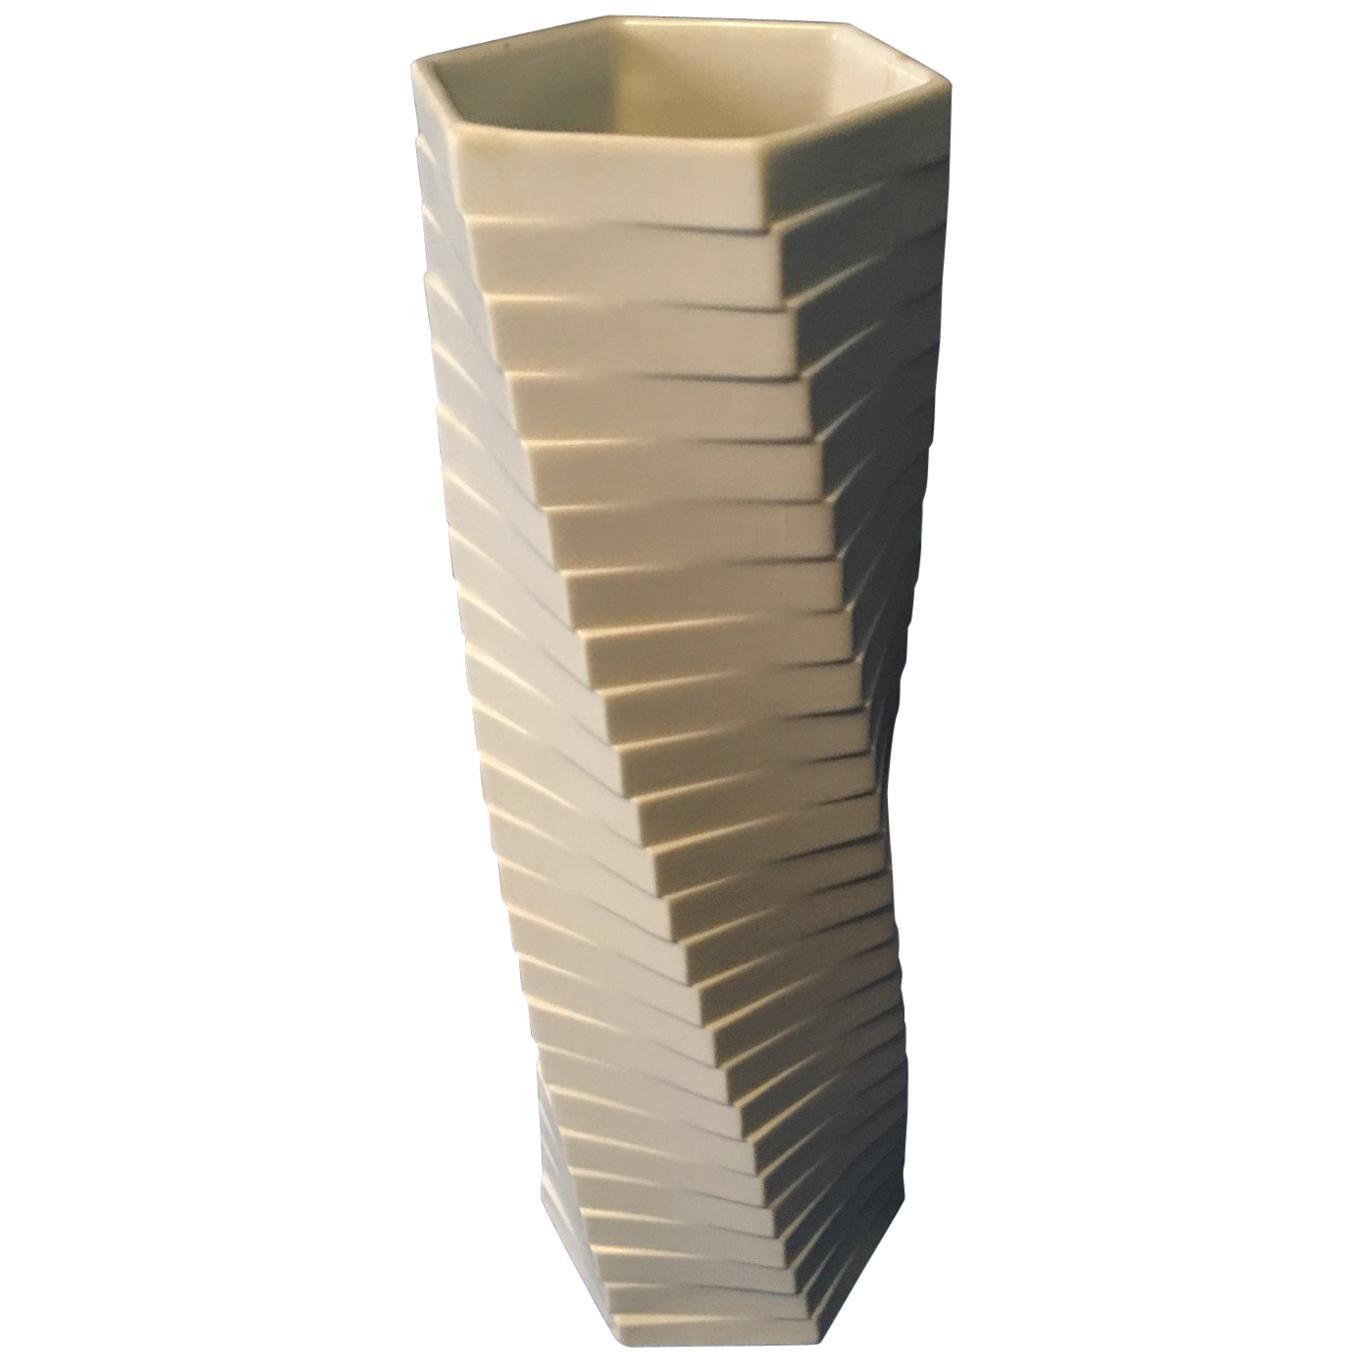 from Rosenthal Studio Geometric White Matt Vase Pisa by Werner Uhl